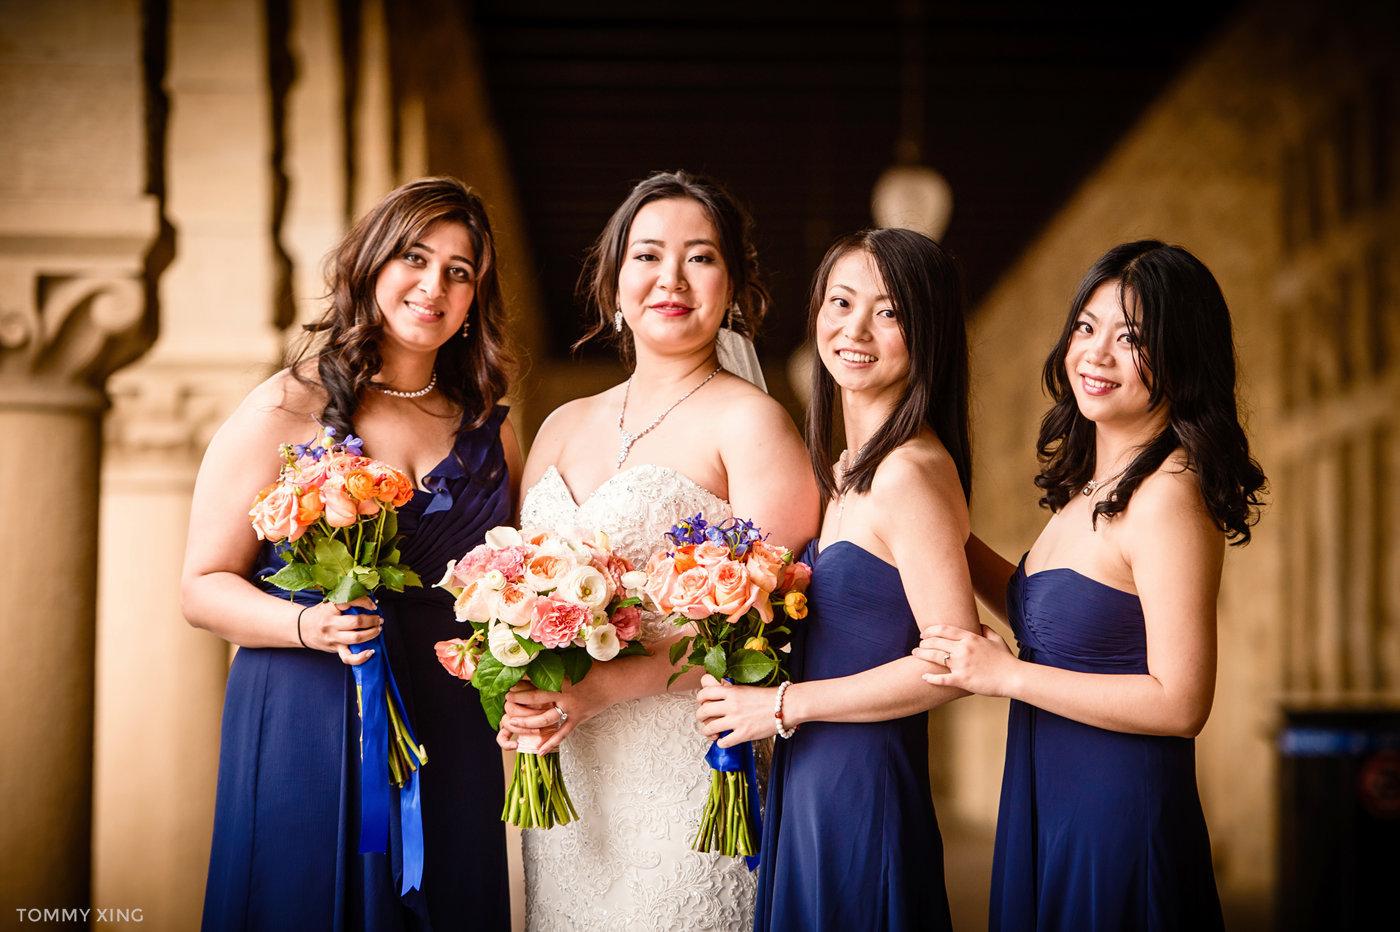 STANFORD MEMORIAL CHURCH WEDDING - Wenjie & Chengcheng - SAN FRANCISCO BAY AREA 斯坦福教堂婚礼跟拍 - 洛杉矶婚礼婚纱照摄影师 Tommy Xing Photography147.jpg